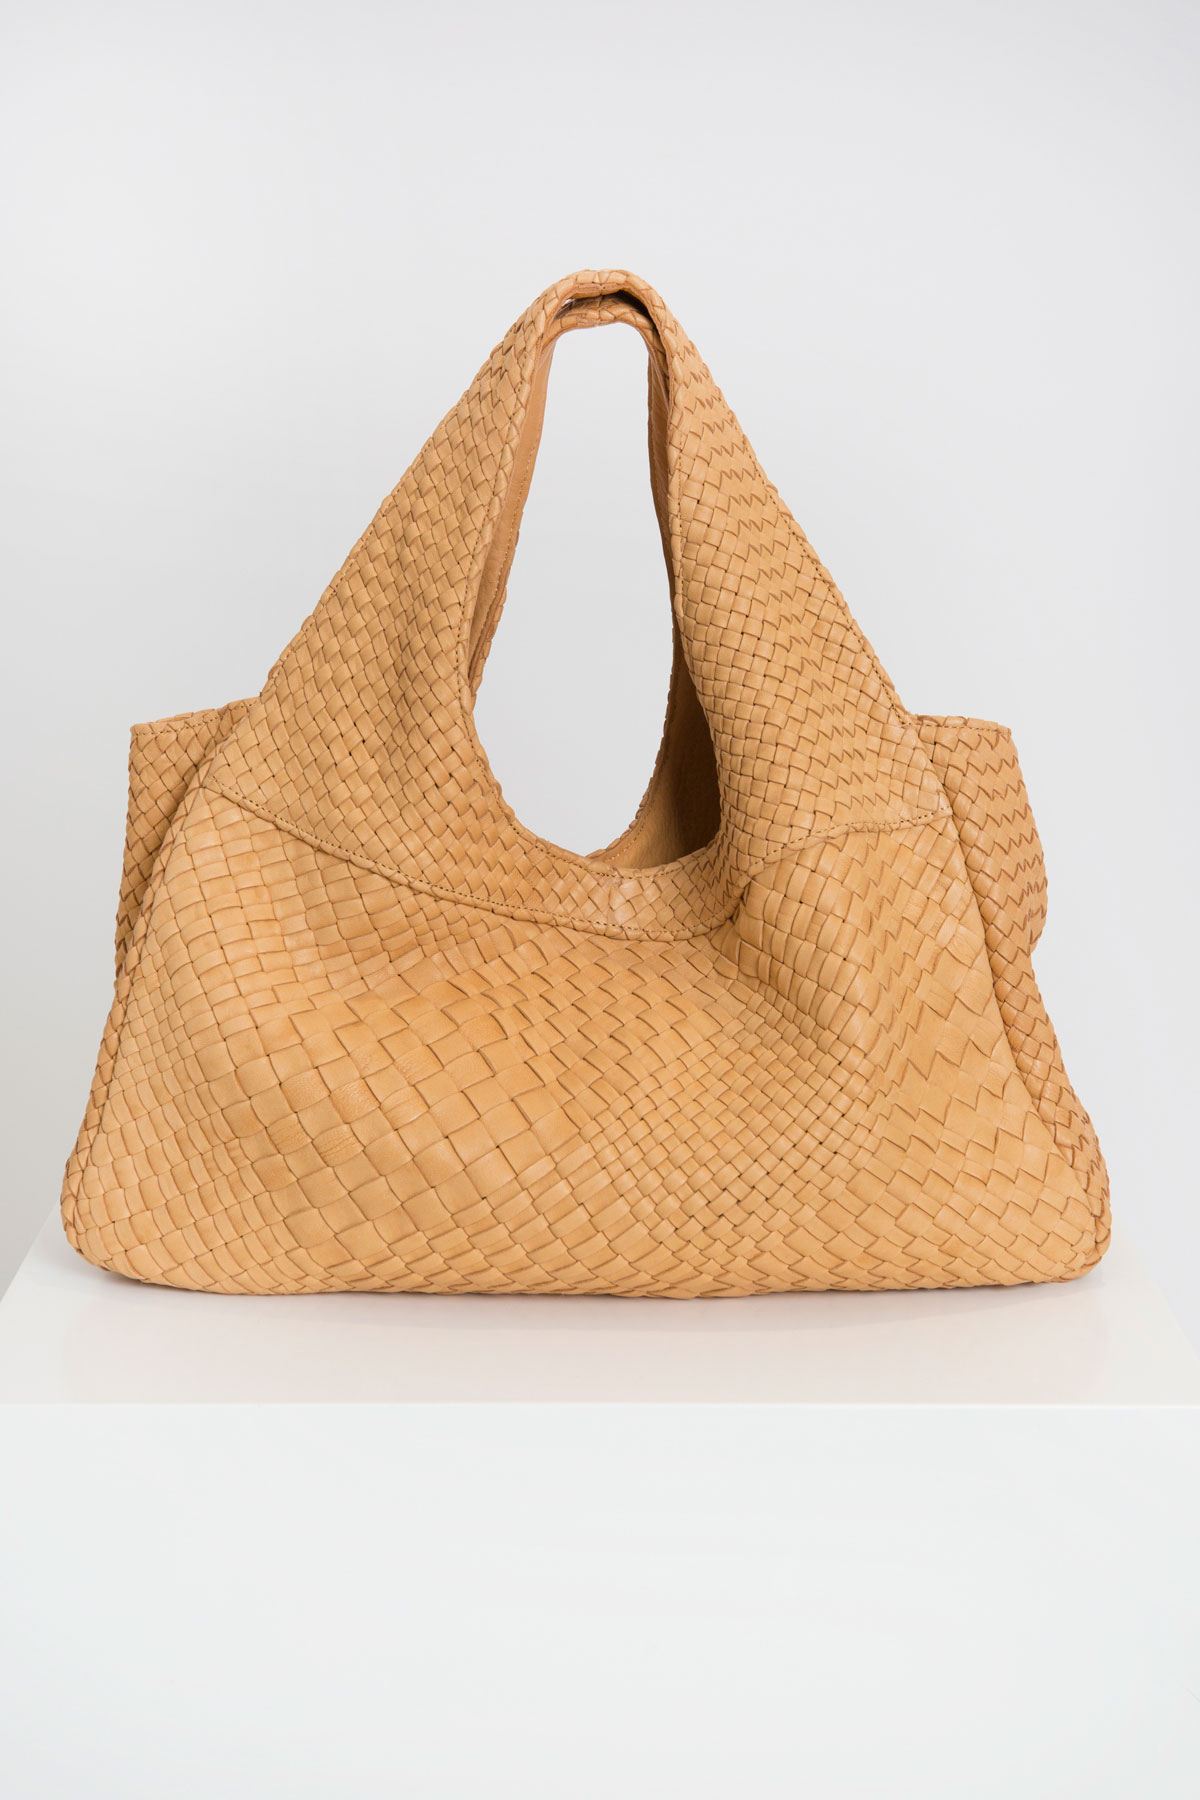 pablo-claramonte-weaved-bag-matchboxathens